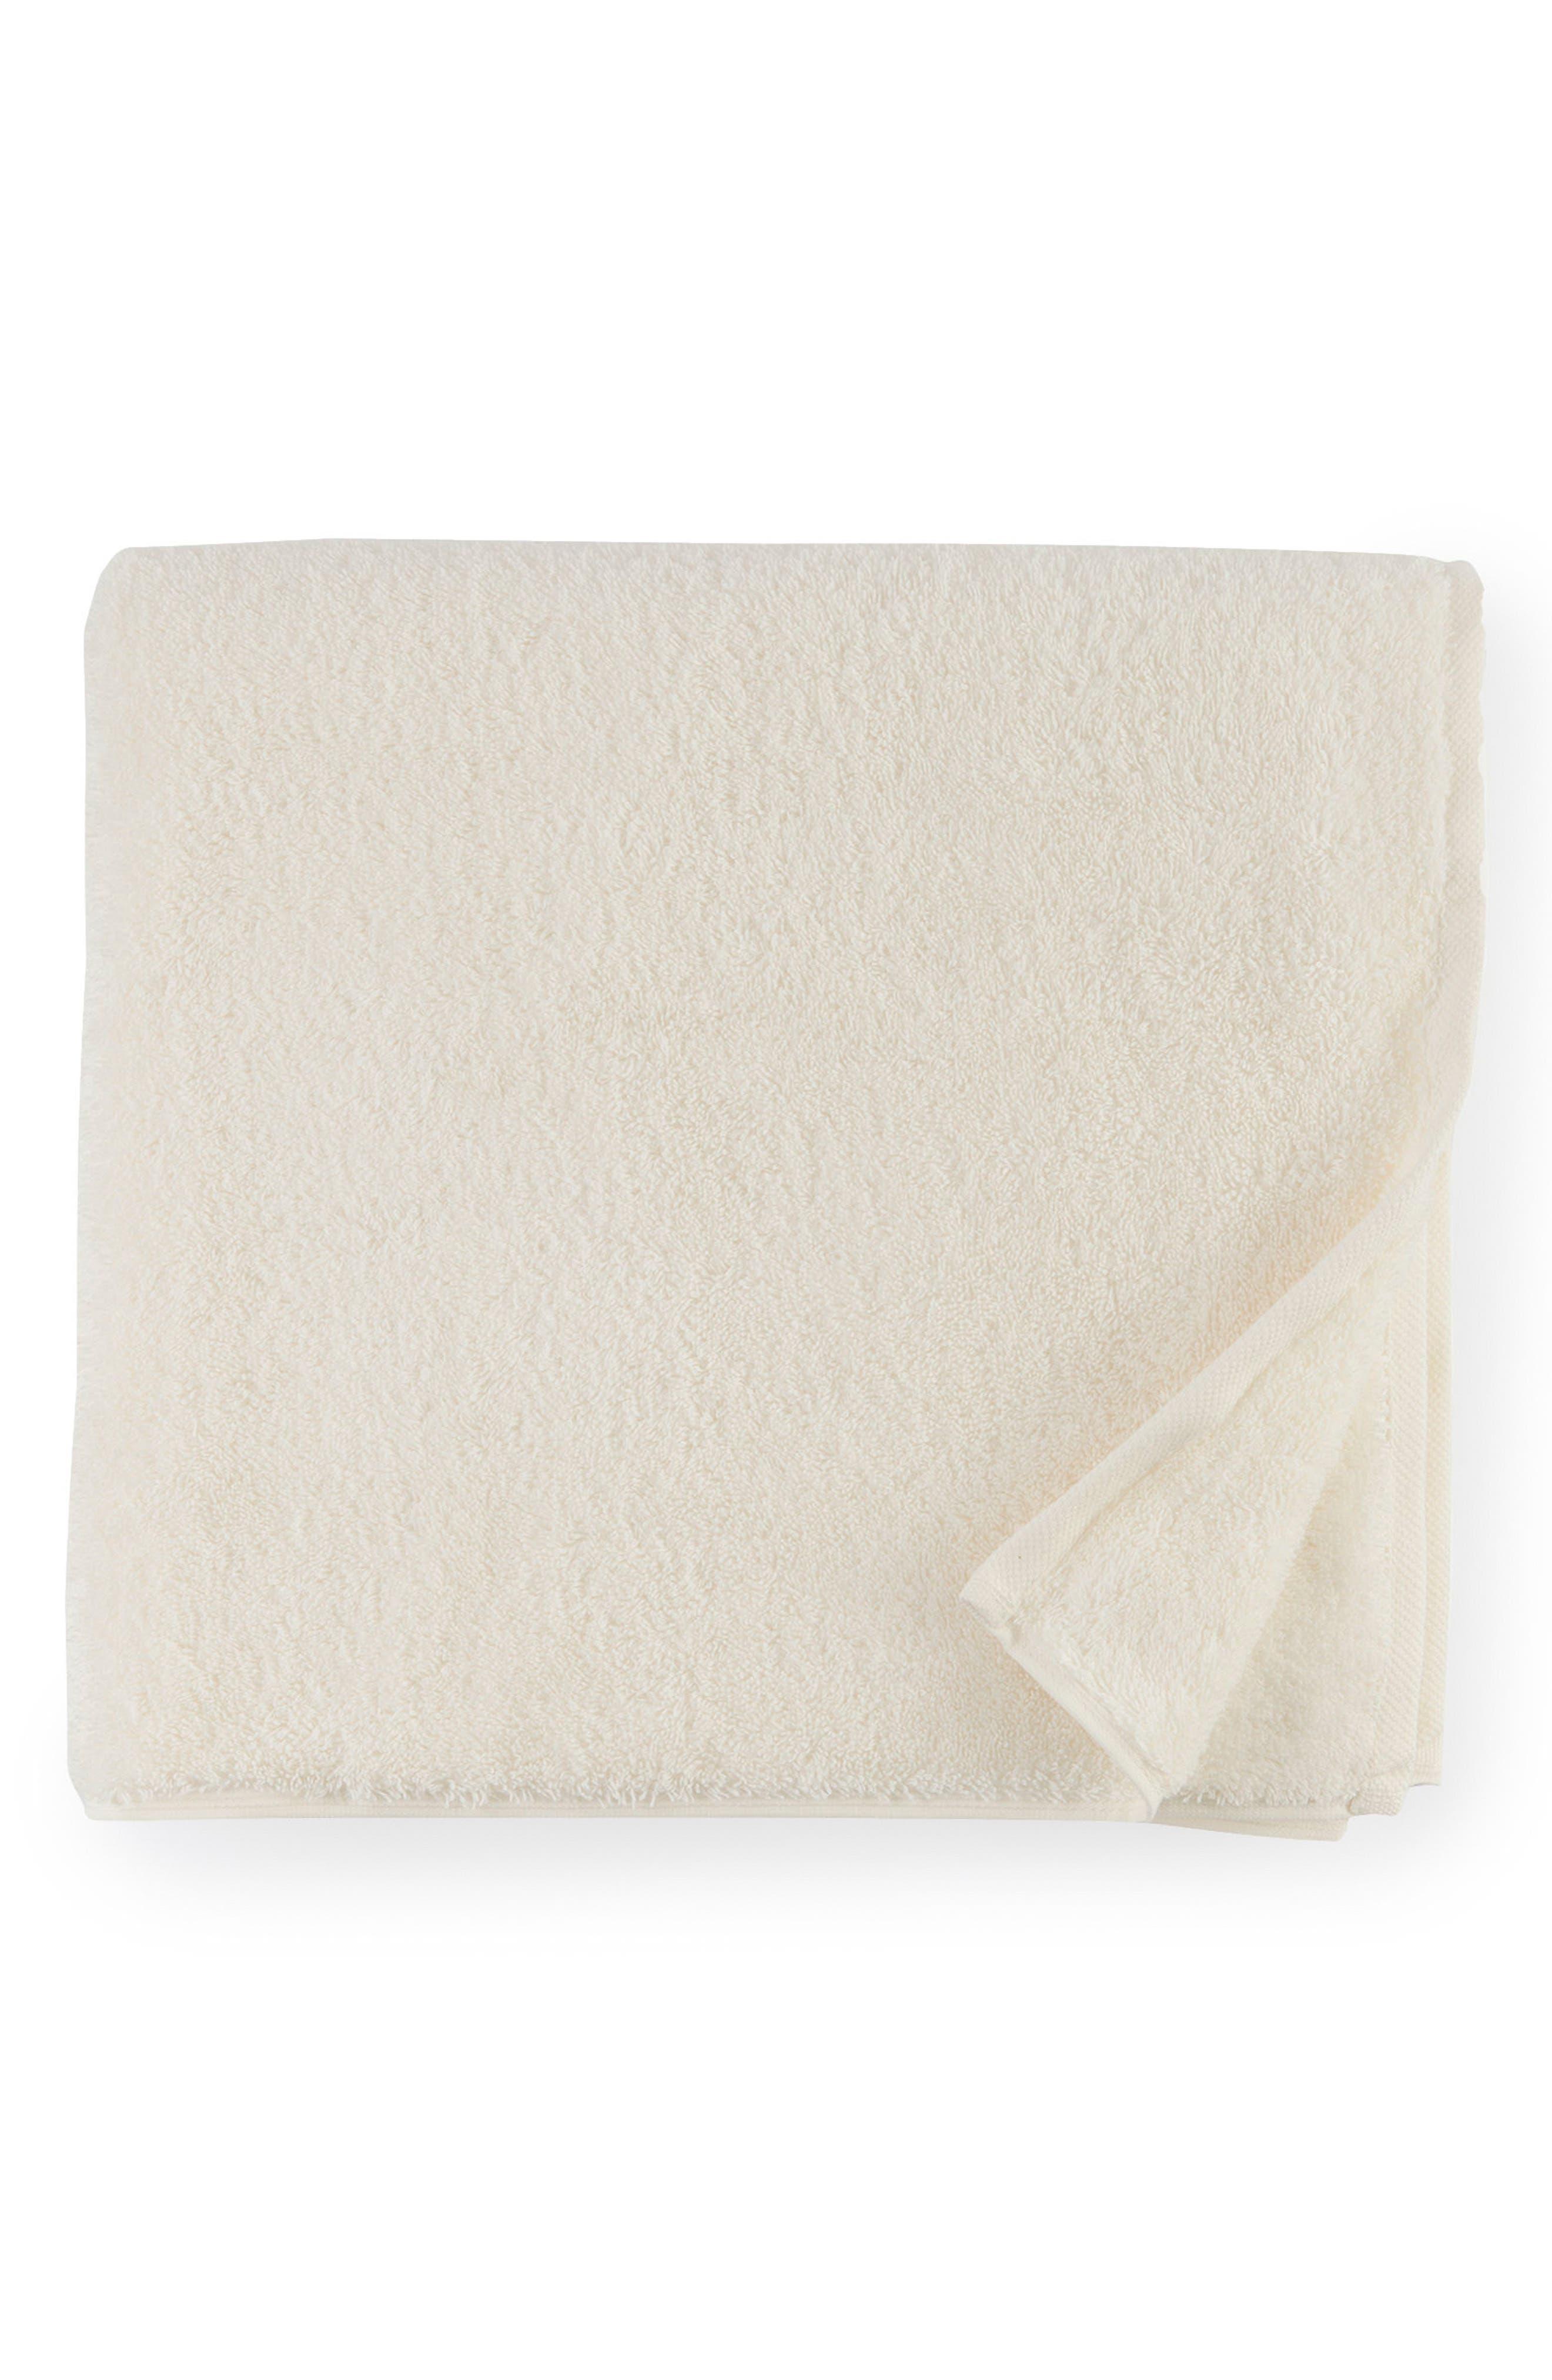 Main Image - SFERRA Sarma Hand Towel